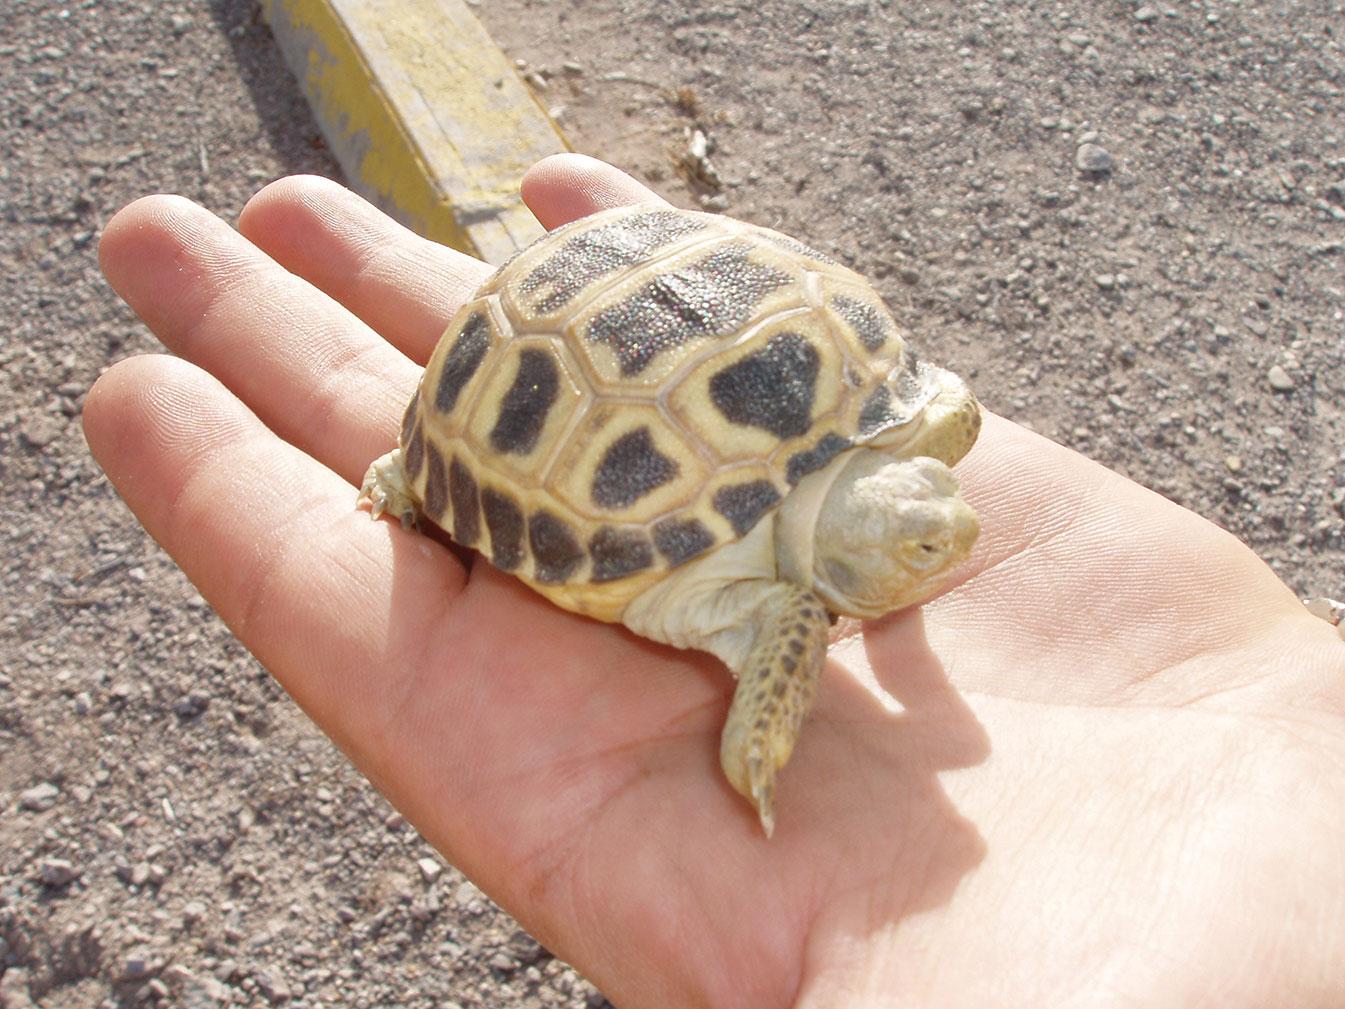 Photograph of small bolson tortoise at Bolsón de Mapimí by Myles Traphagen